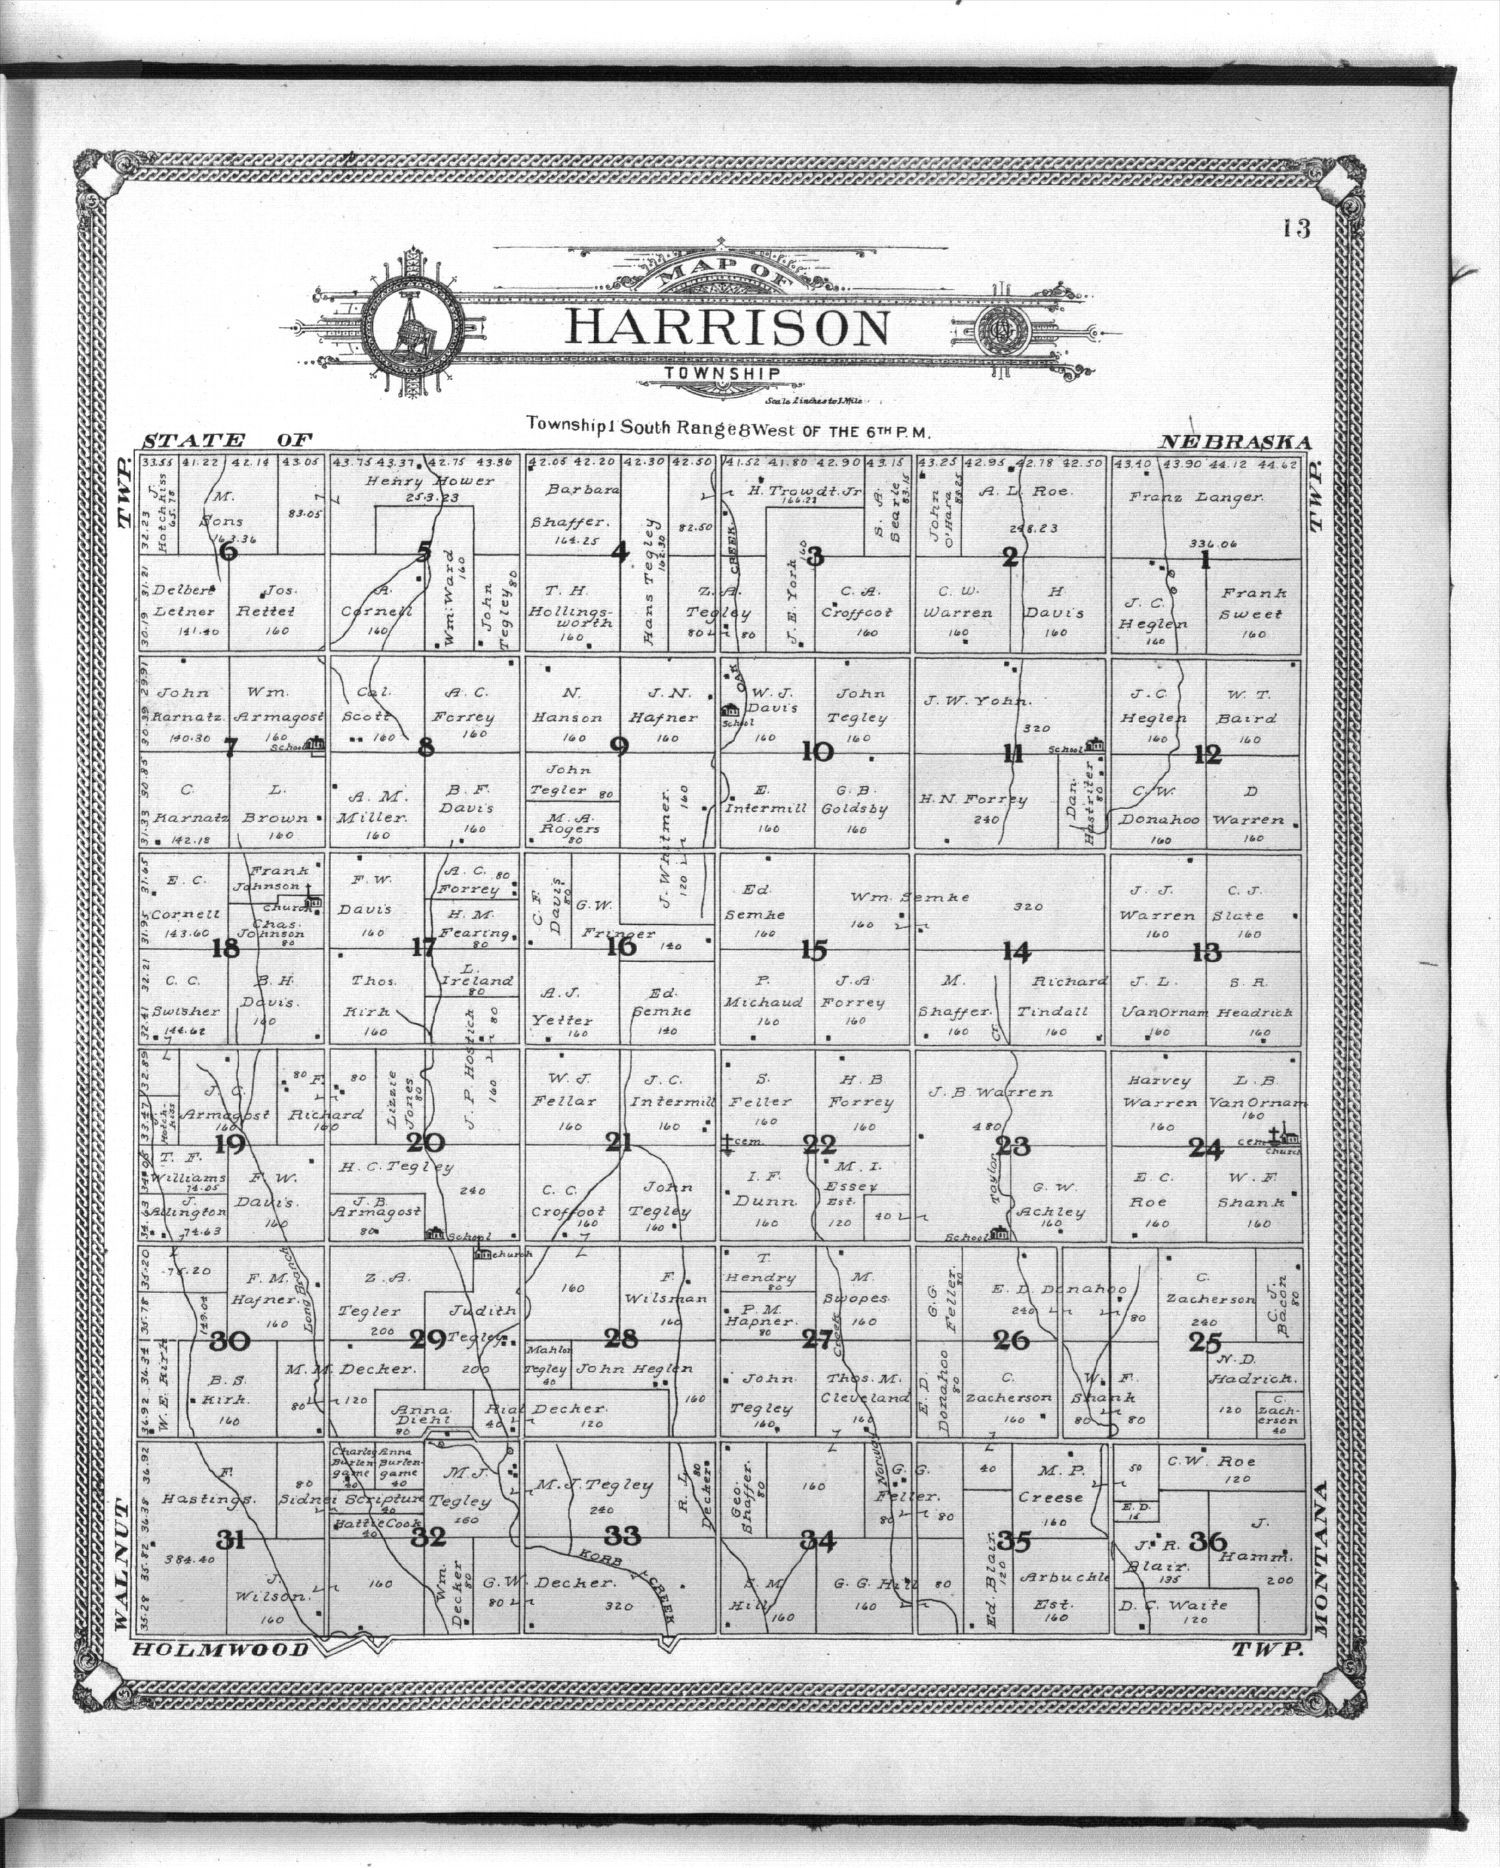 Standard atlas of Jewell County, Kansas - 13